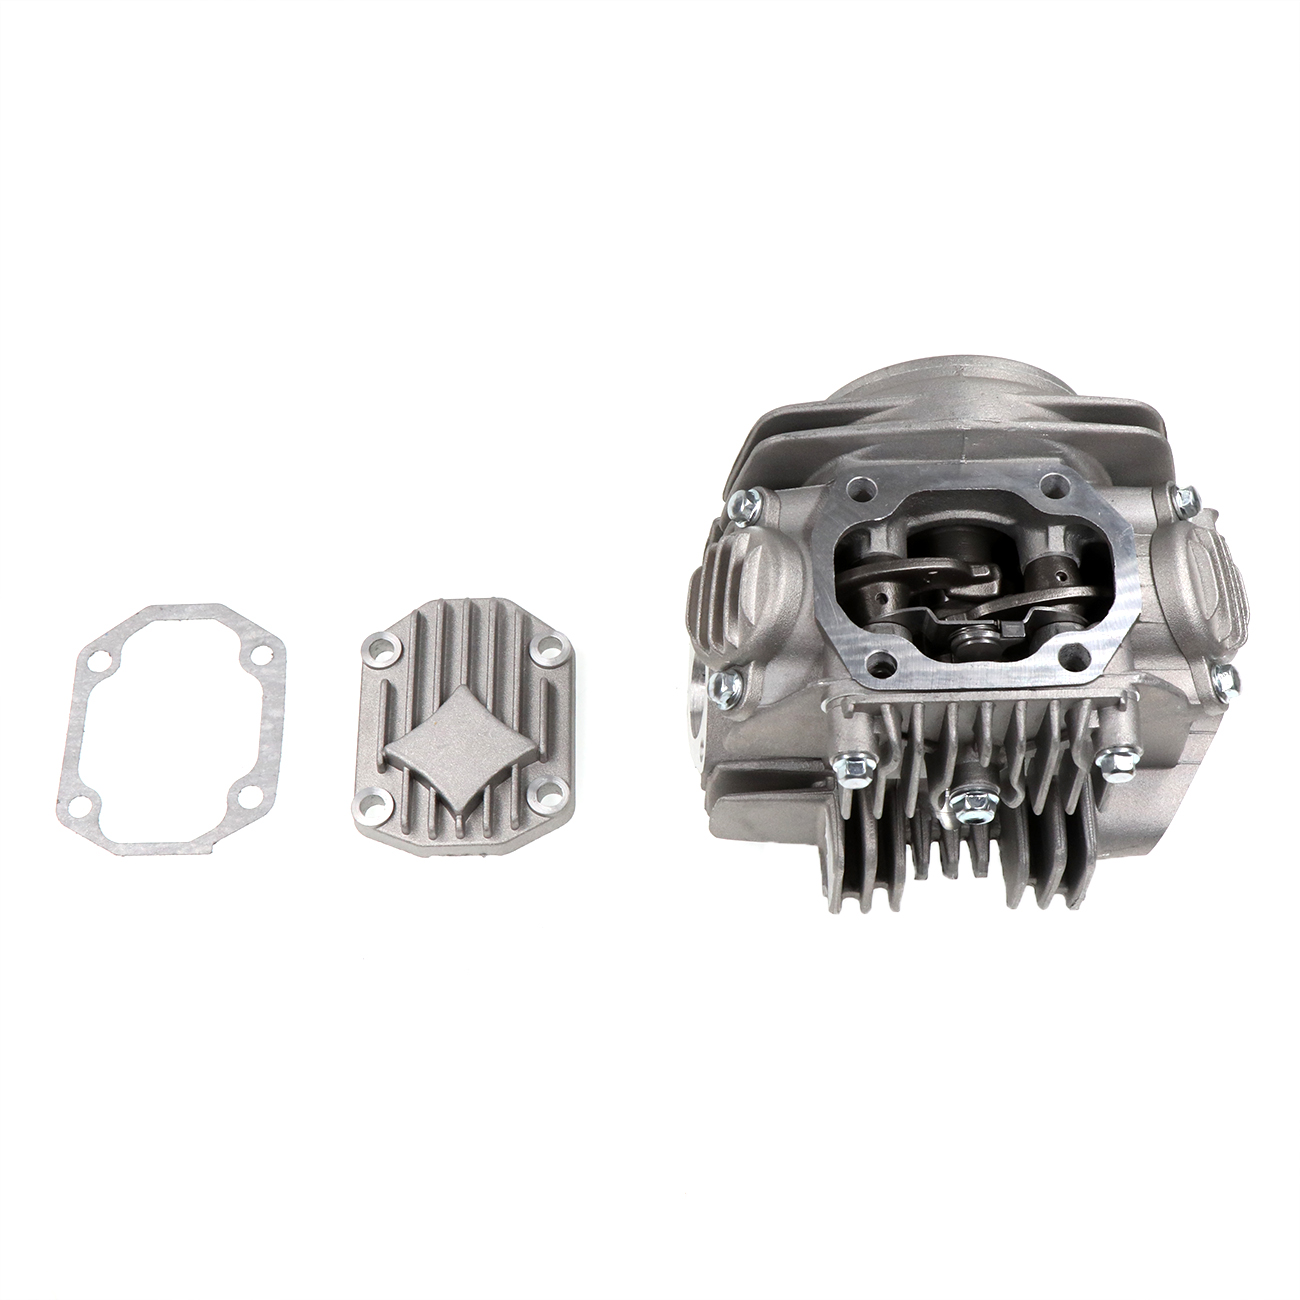 Комплект головки цилиндра двигателя power для мотоцикла YX140cc